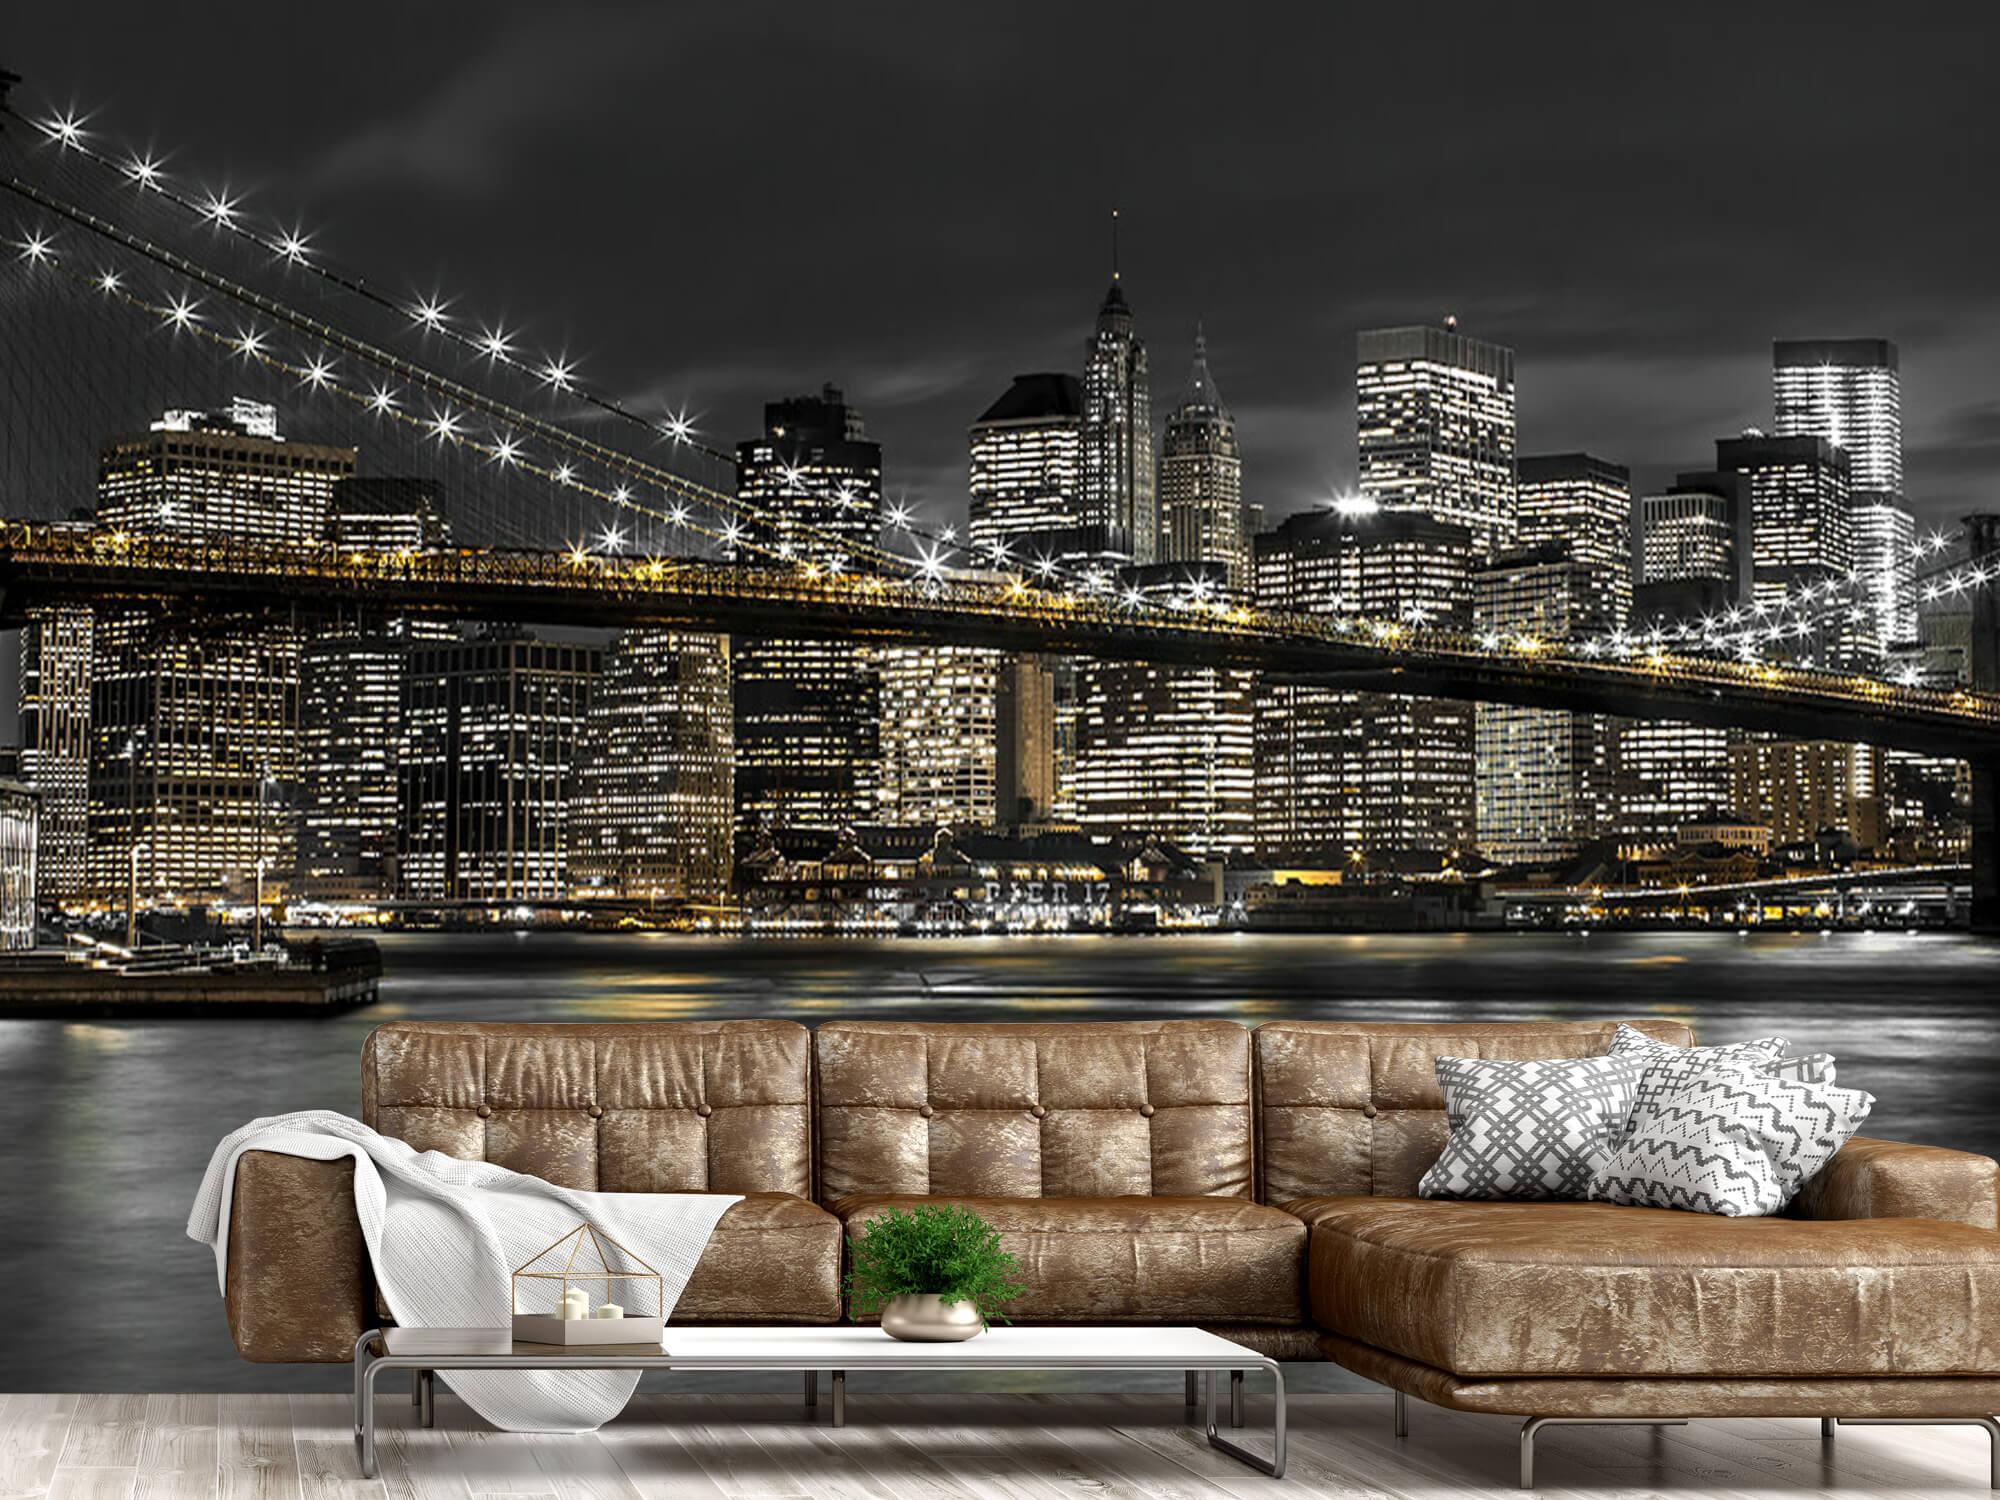 Brooklyn Bridge at Night 2